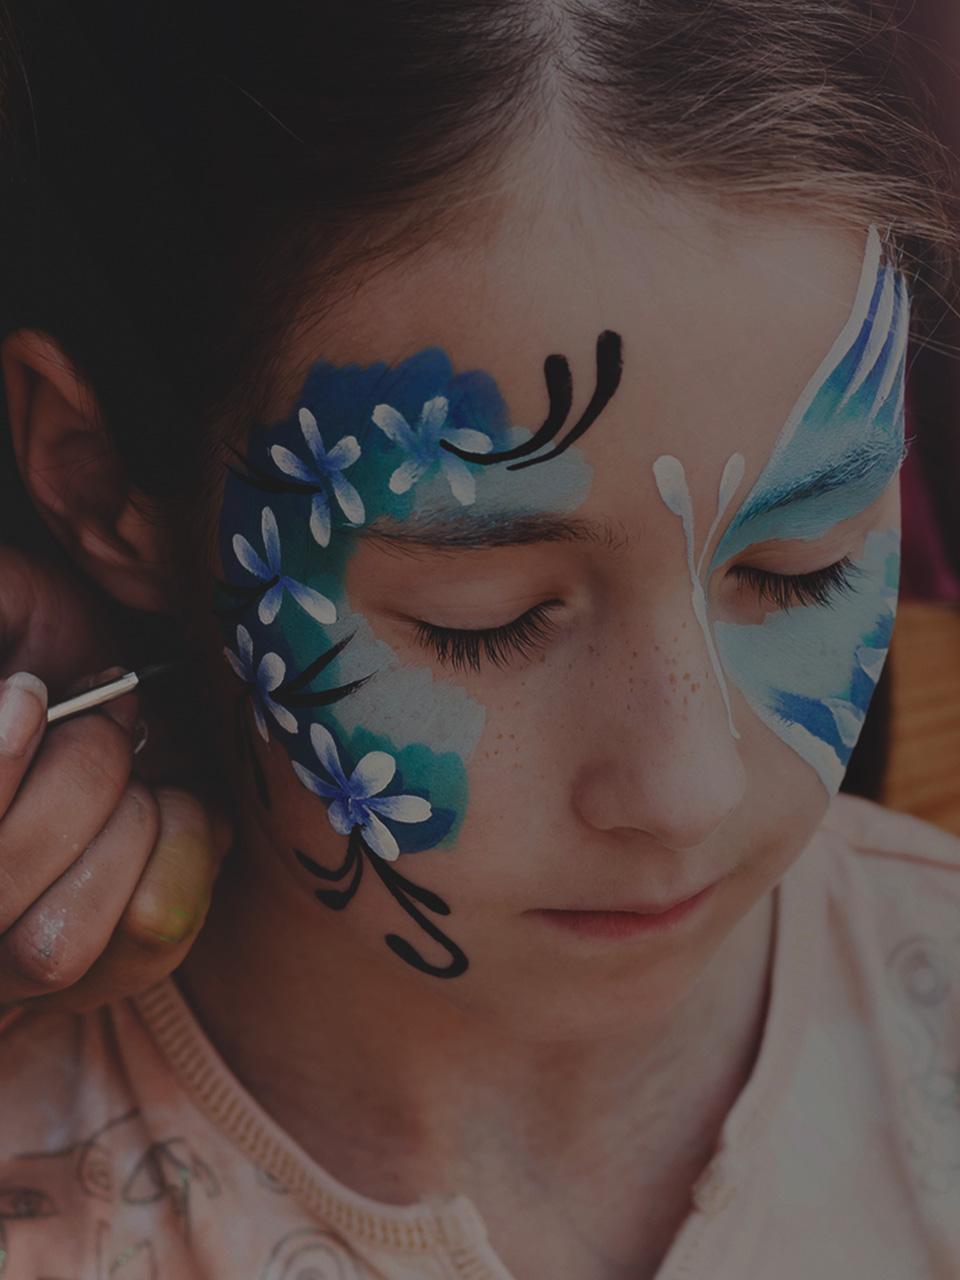 Cute Cheek Art Designs For Face Painting